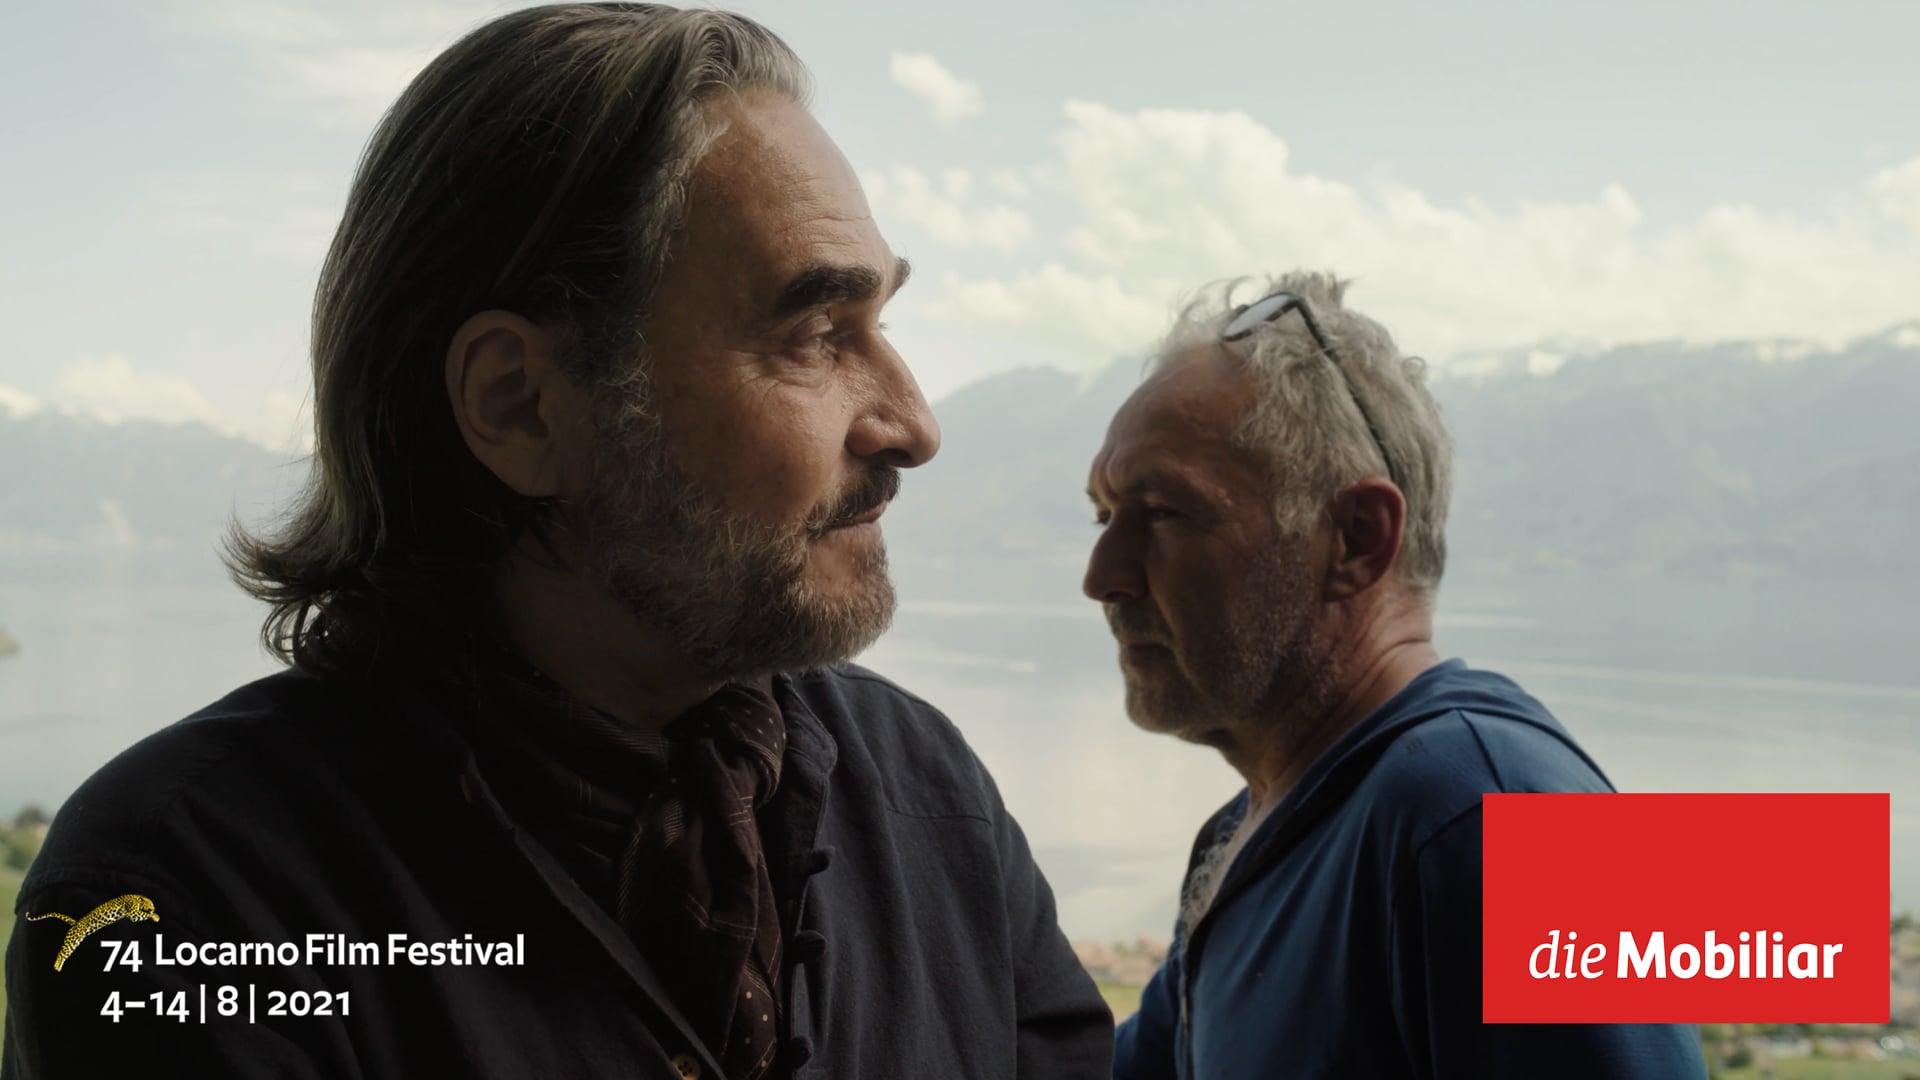 ComeTogether La Mobiliare for the Locarno Film Festival - Stephan Eicher & Gilles Wannaz